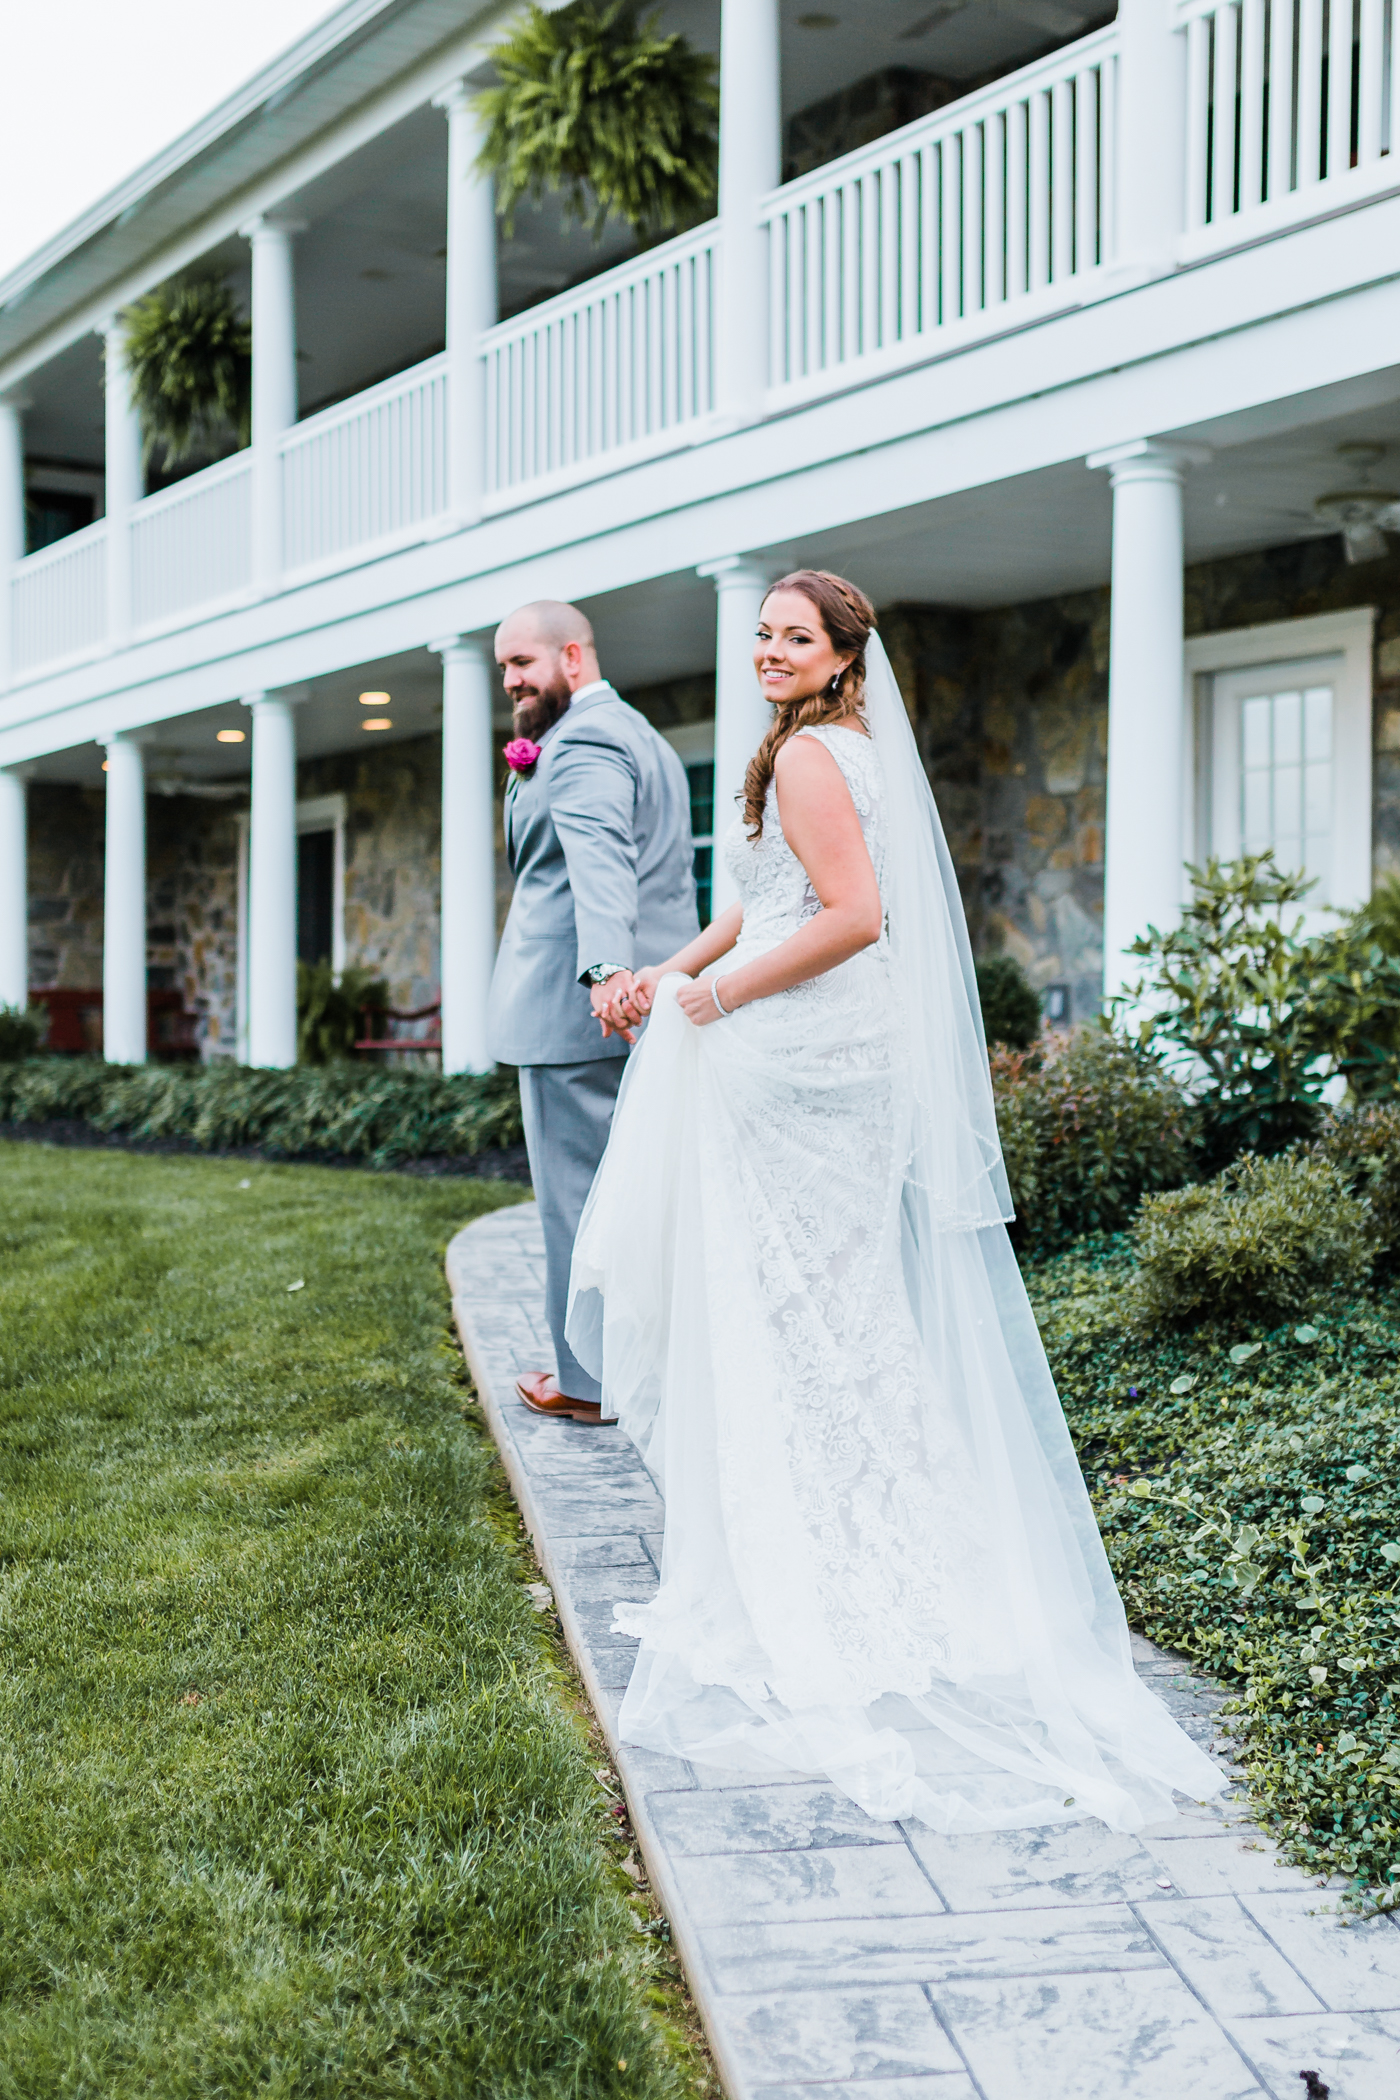 bride smiles back as she walks away with her groom - Maryland wedding photographer